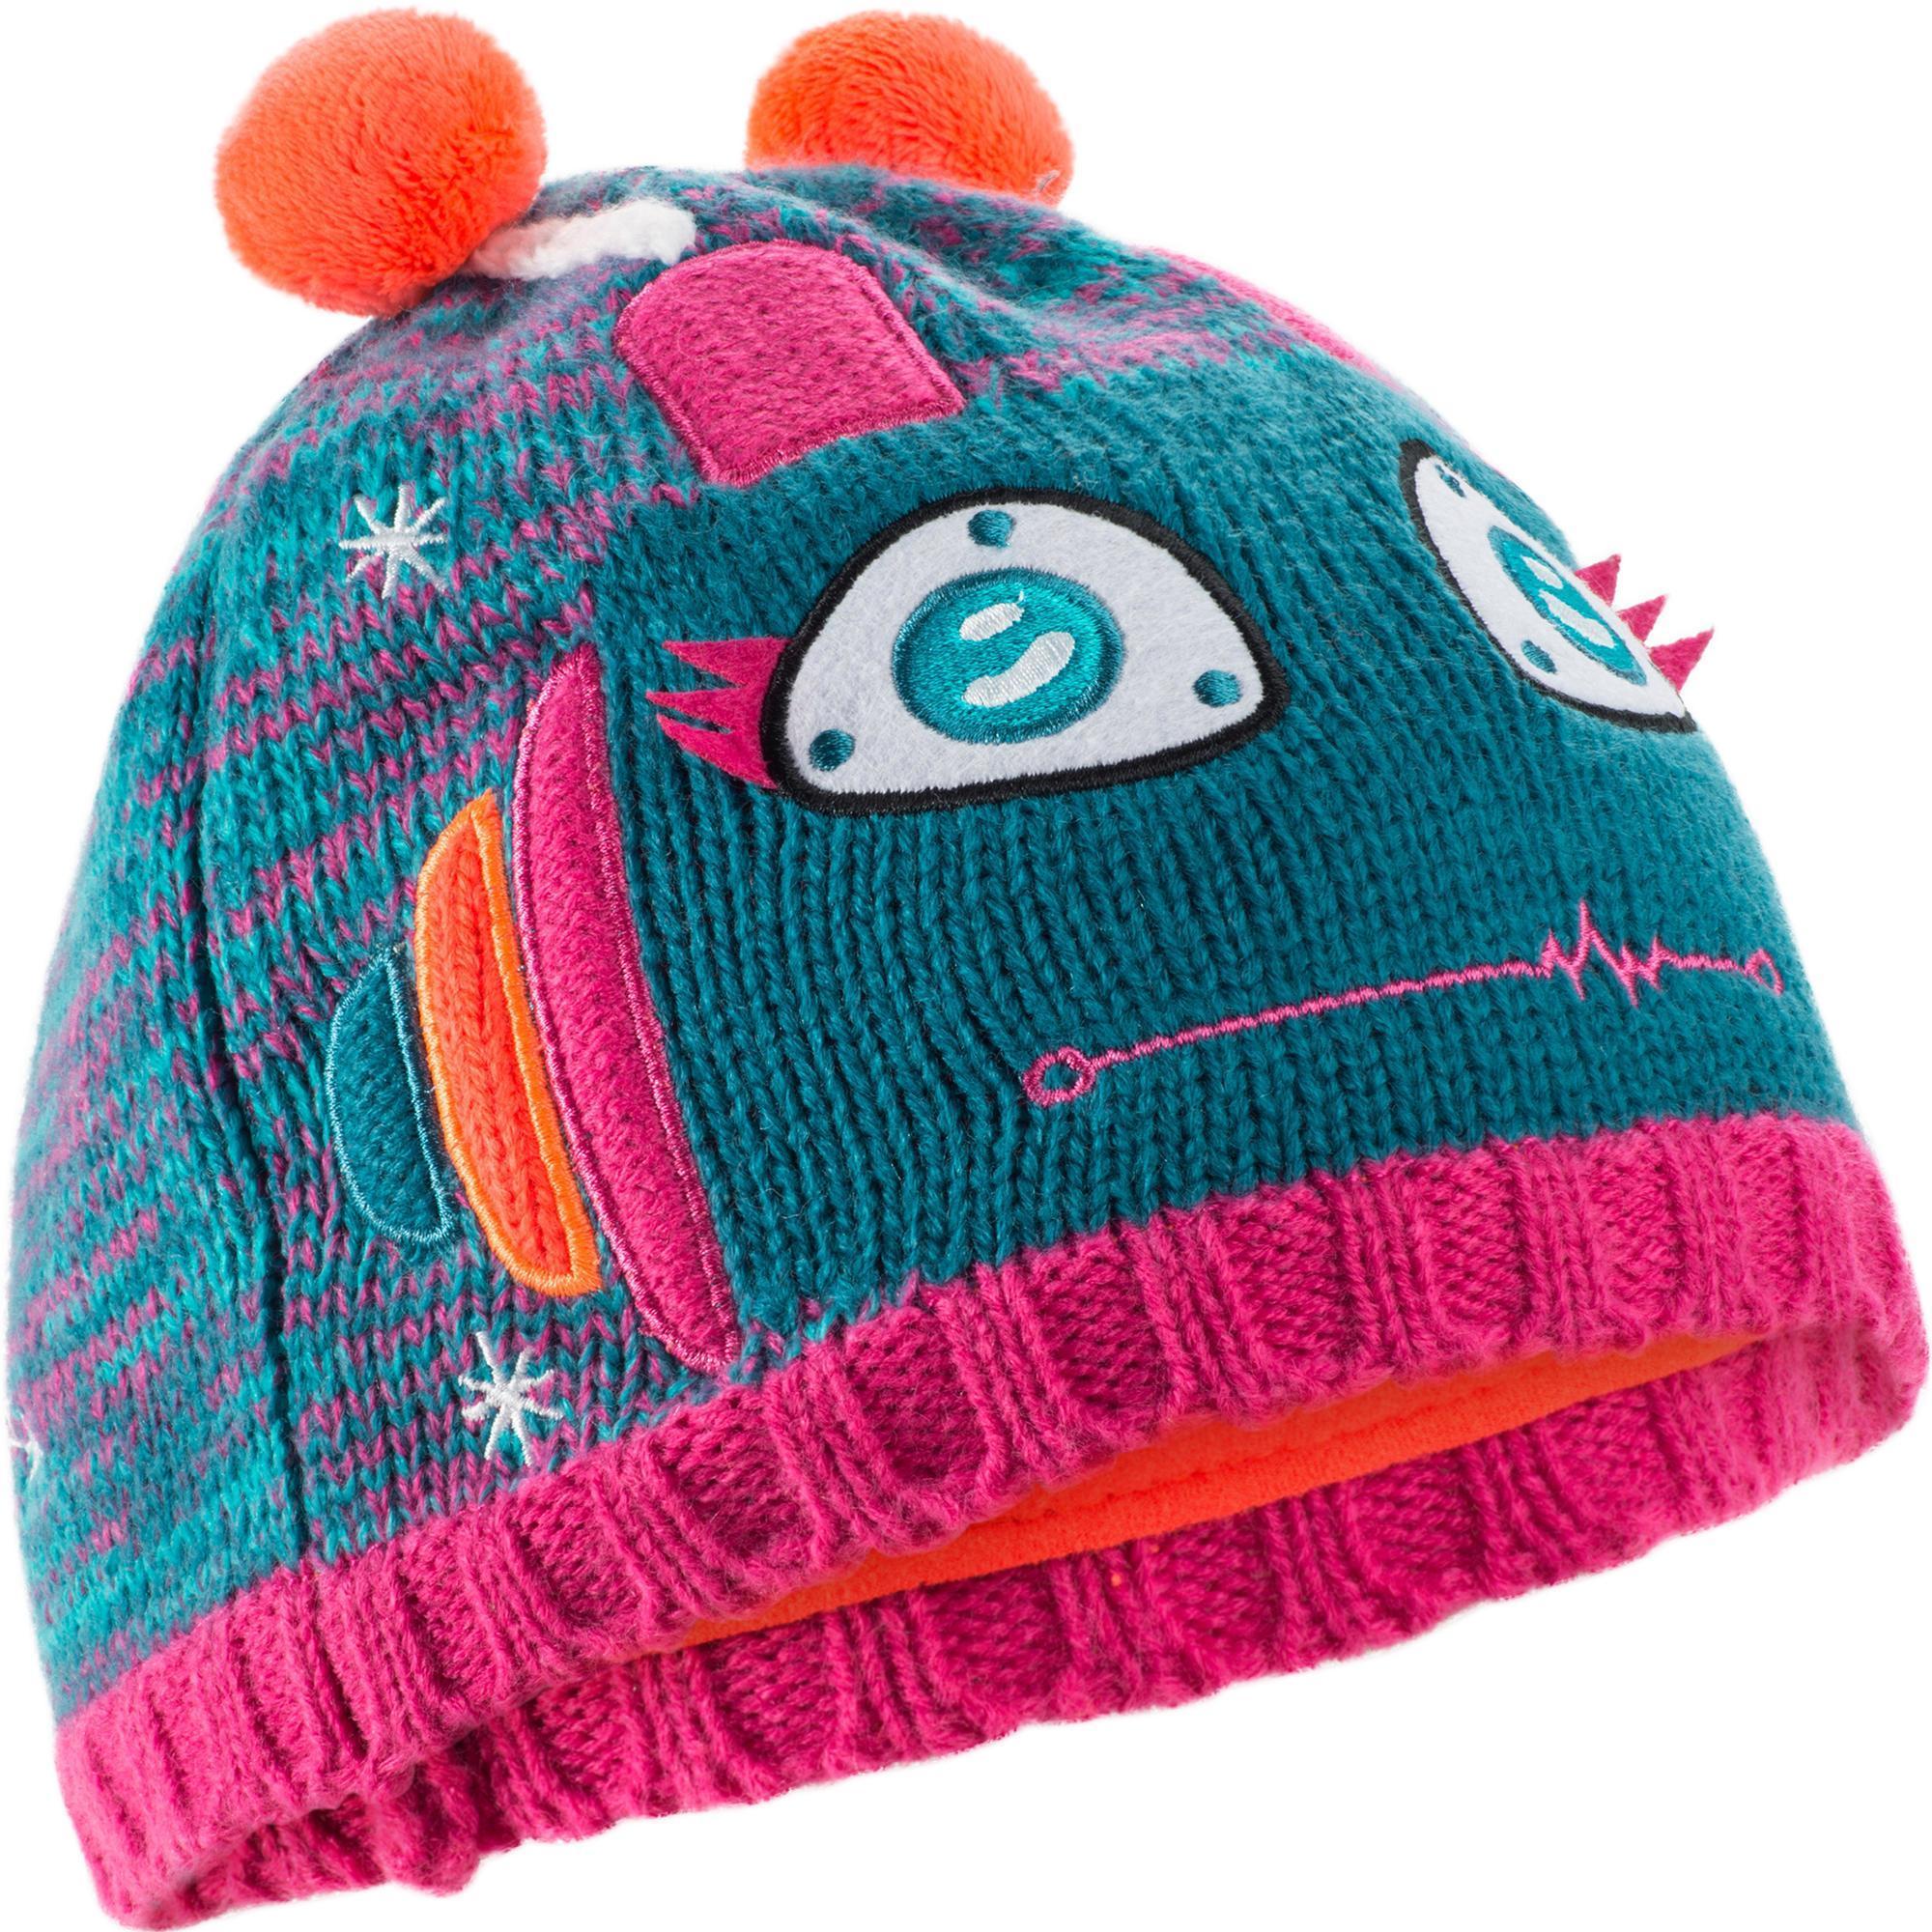 afb9b0f02c94 Bonnets de Ski Enfant   Decathlon